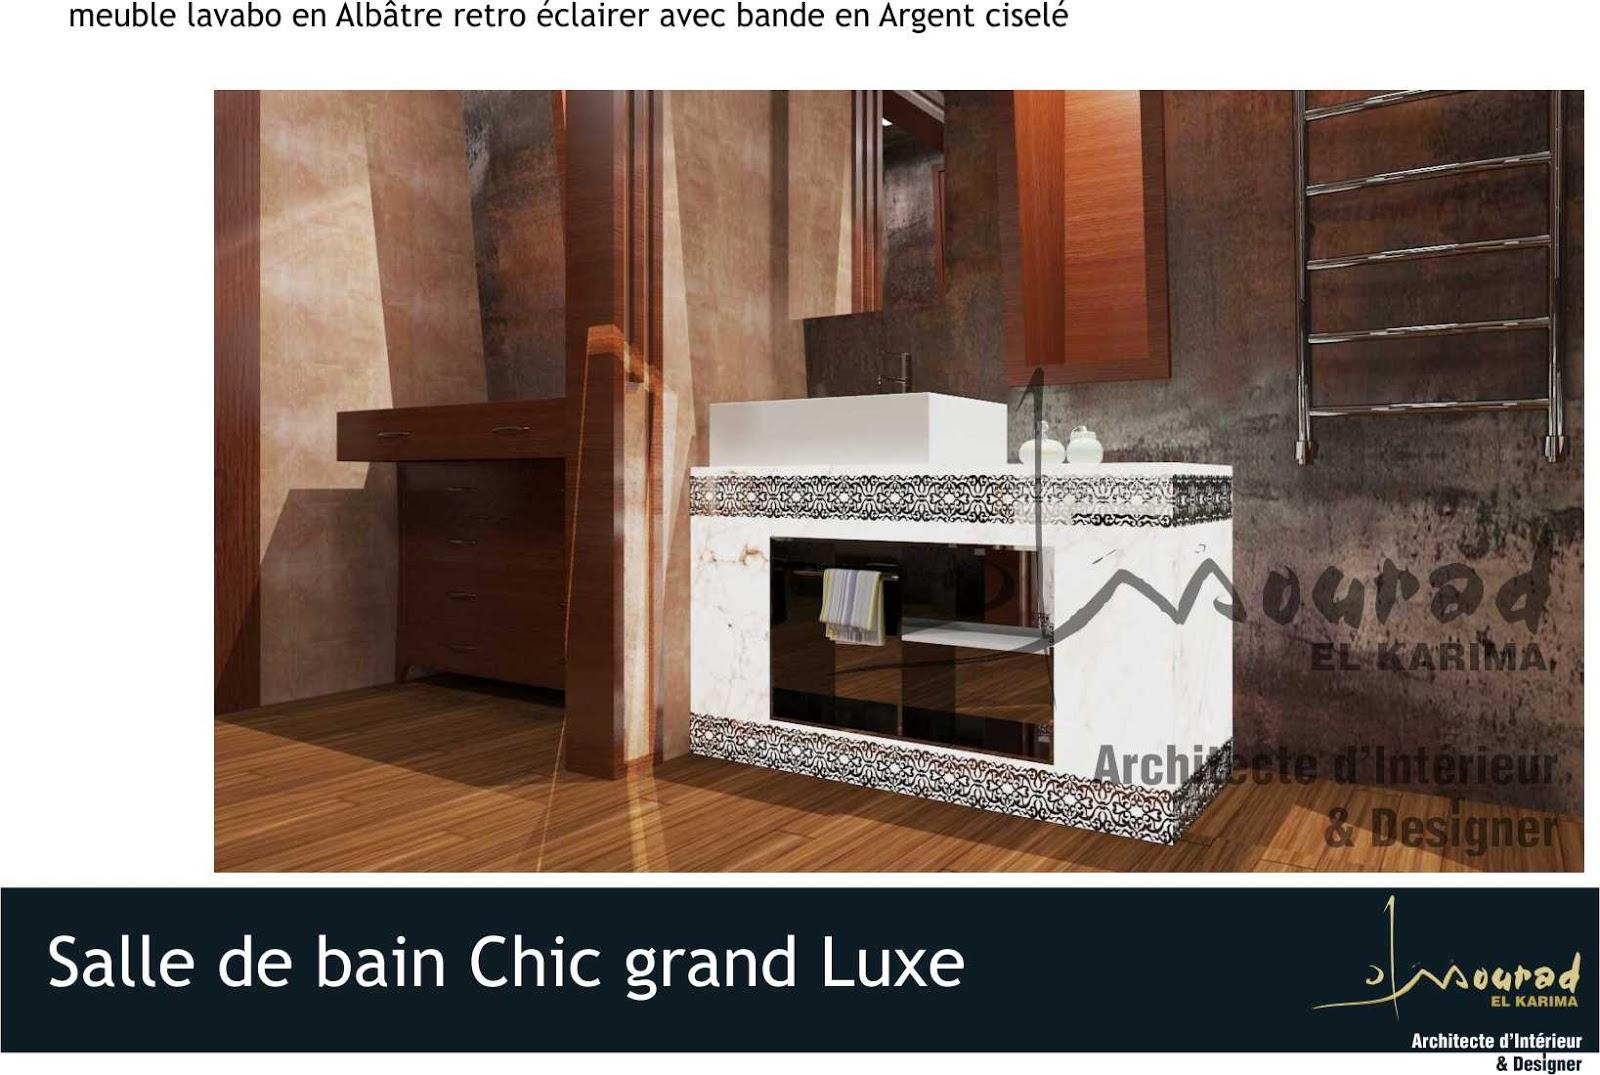 Salle de bain chic grand luxe mourad el karima for Salle bain chic